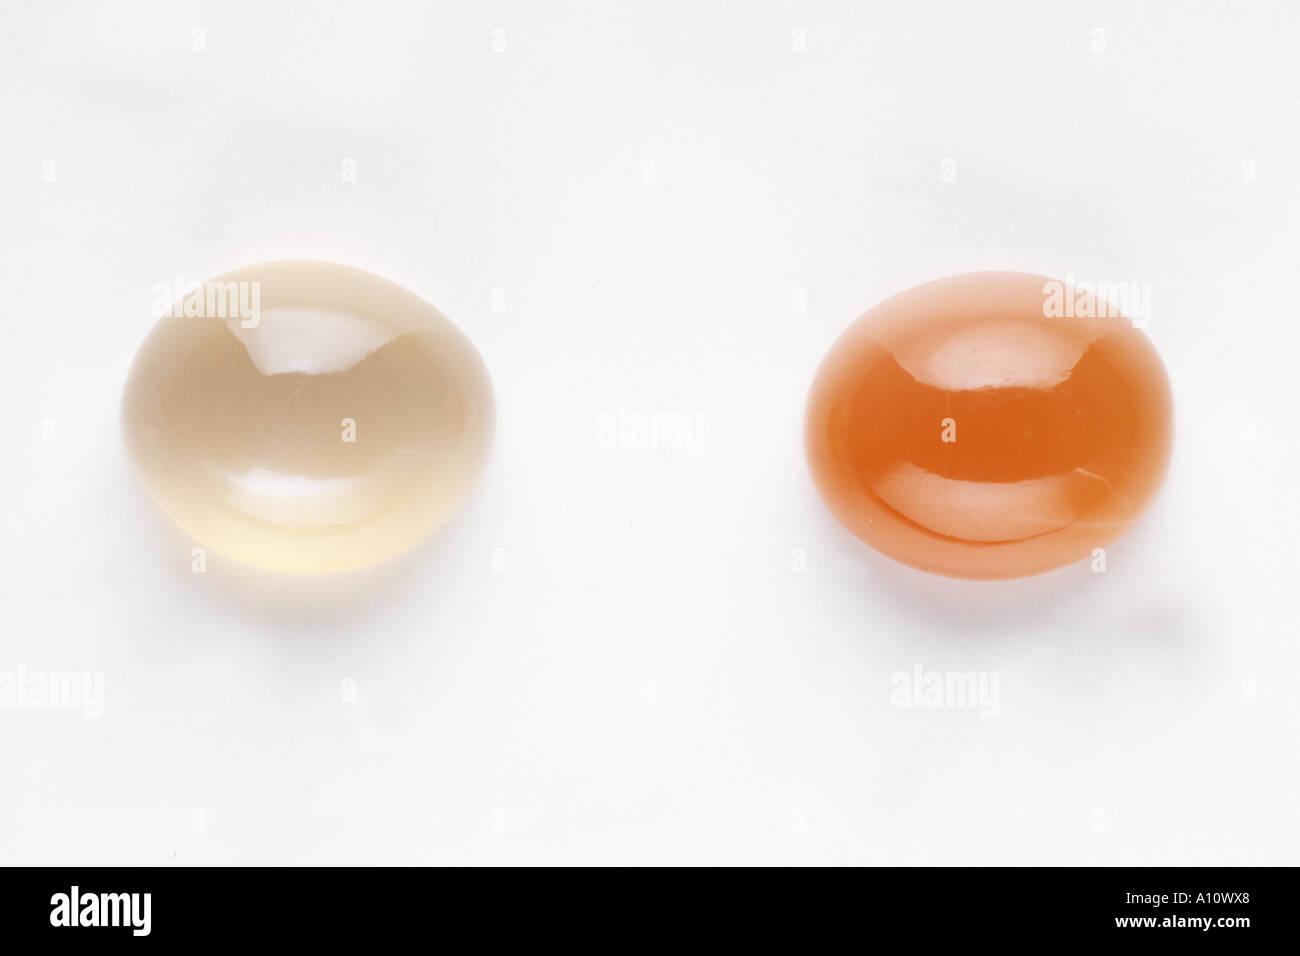 Moon Stone Peach Two Shades Semi Precious Stones - Stock Image